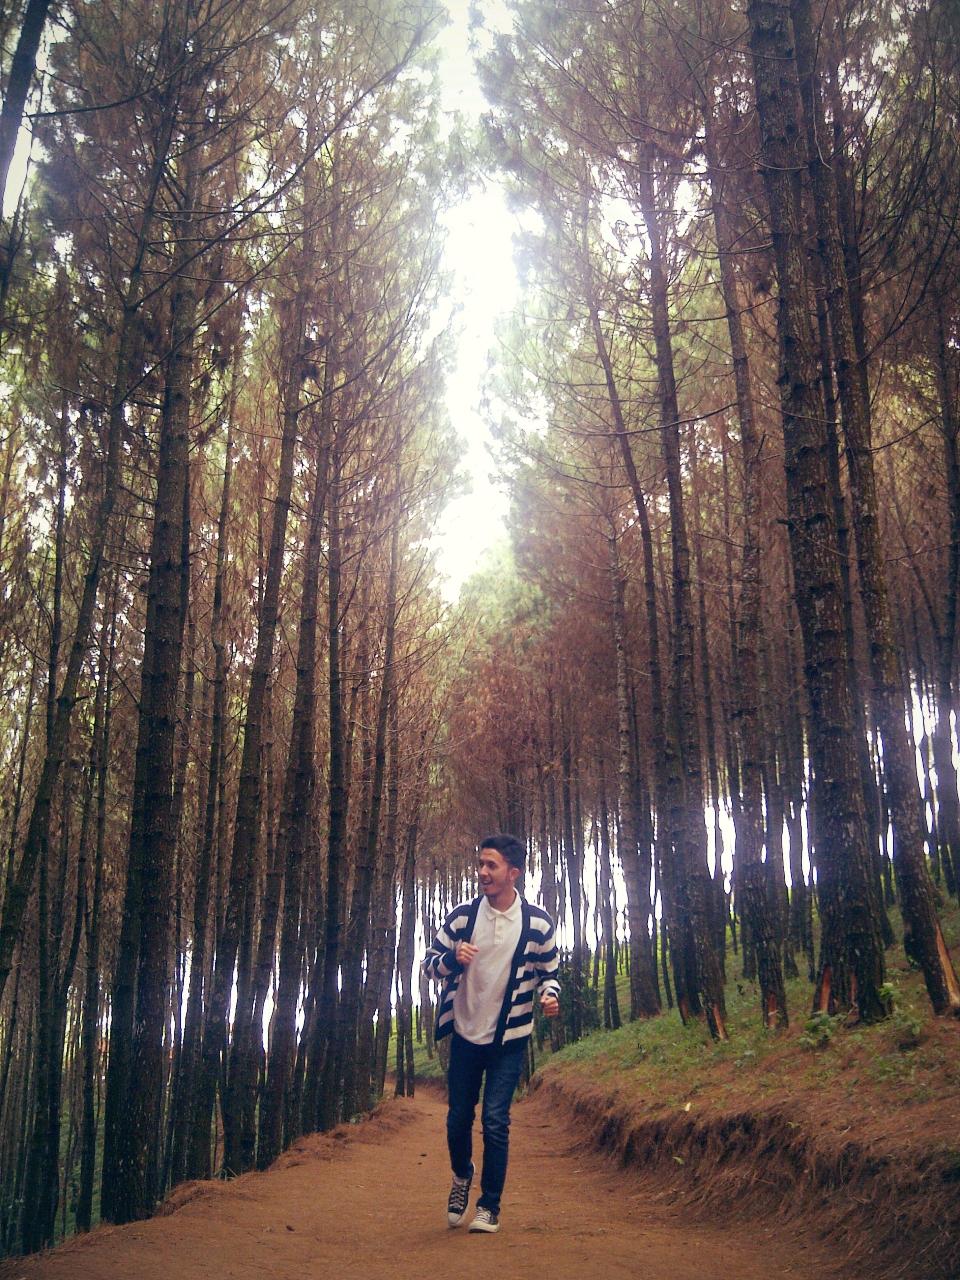 Replika Tempat di Dunia yang ada di Bandung – Ridwan Nur